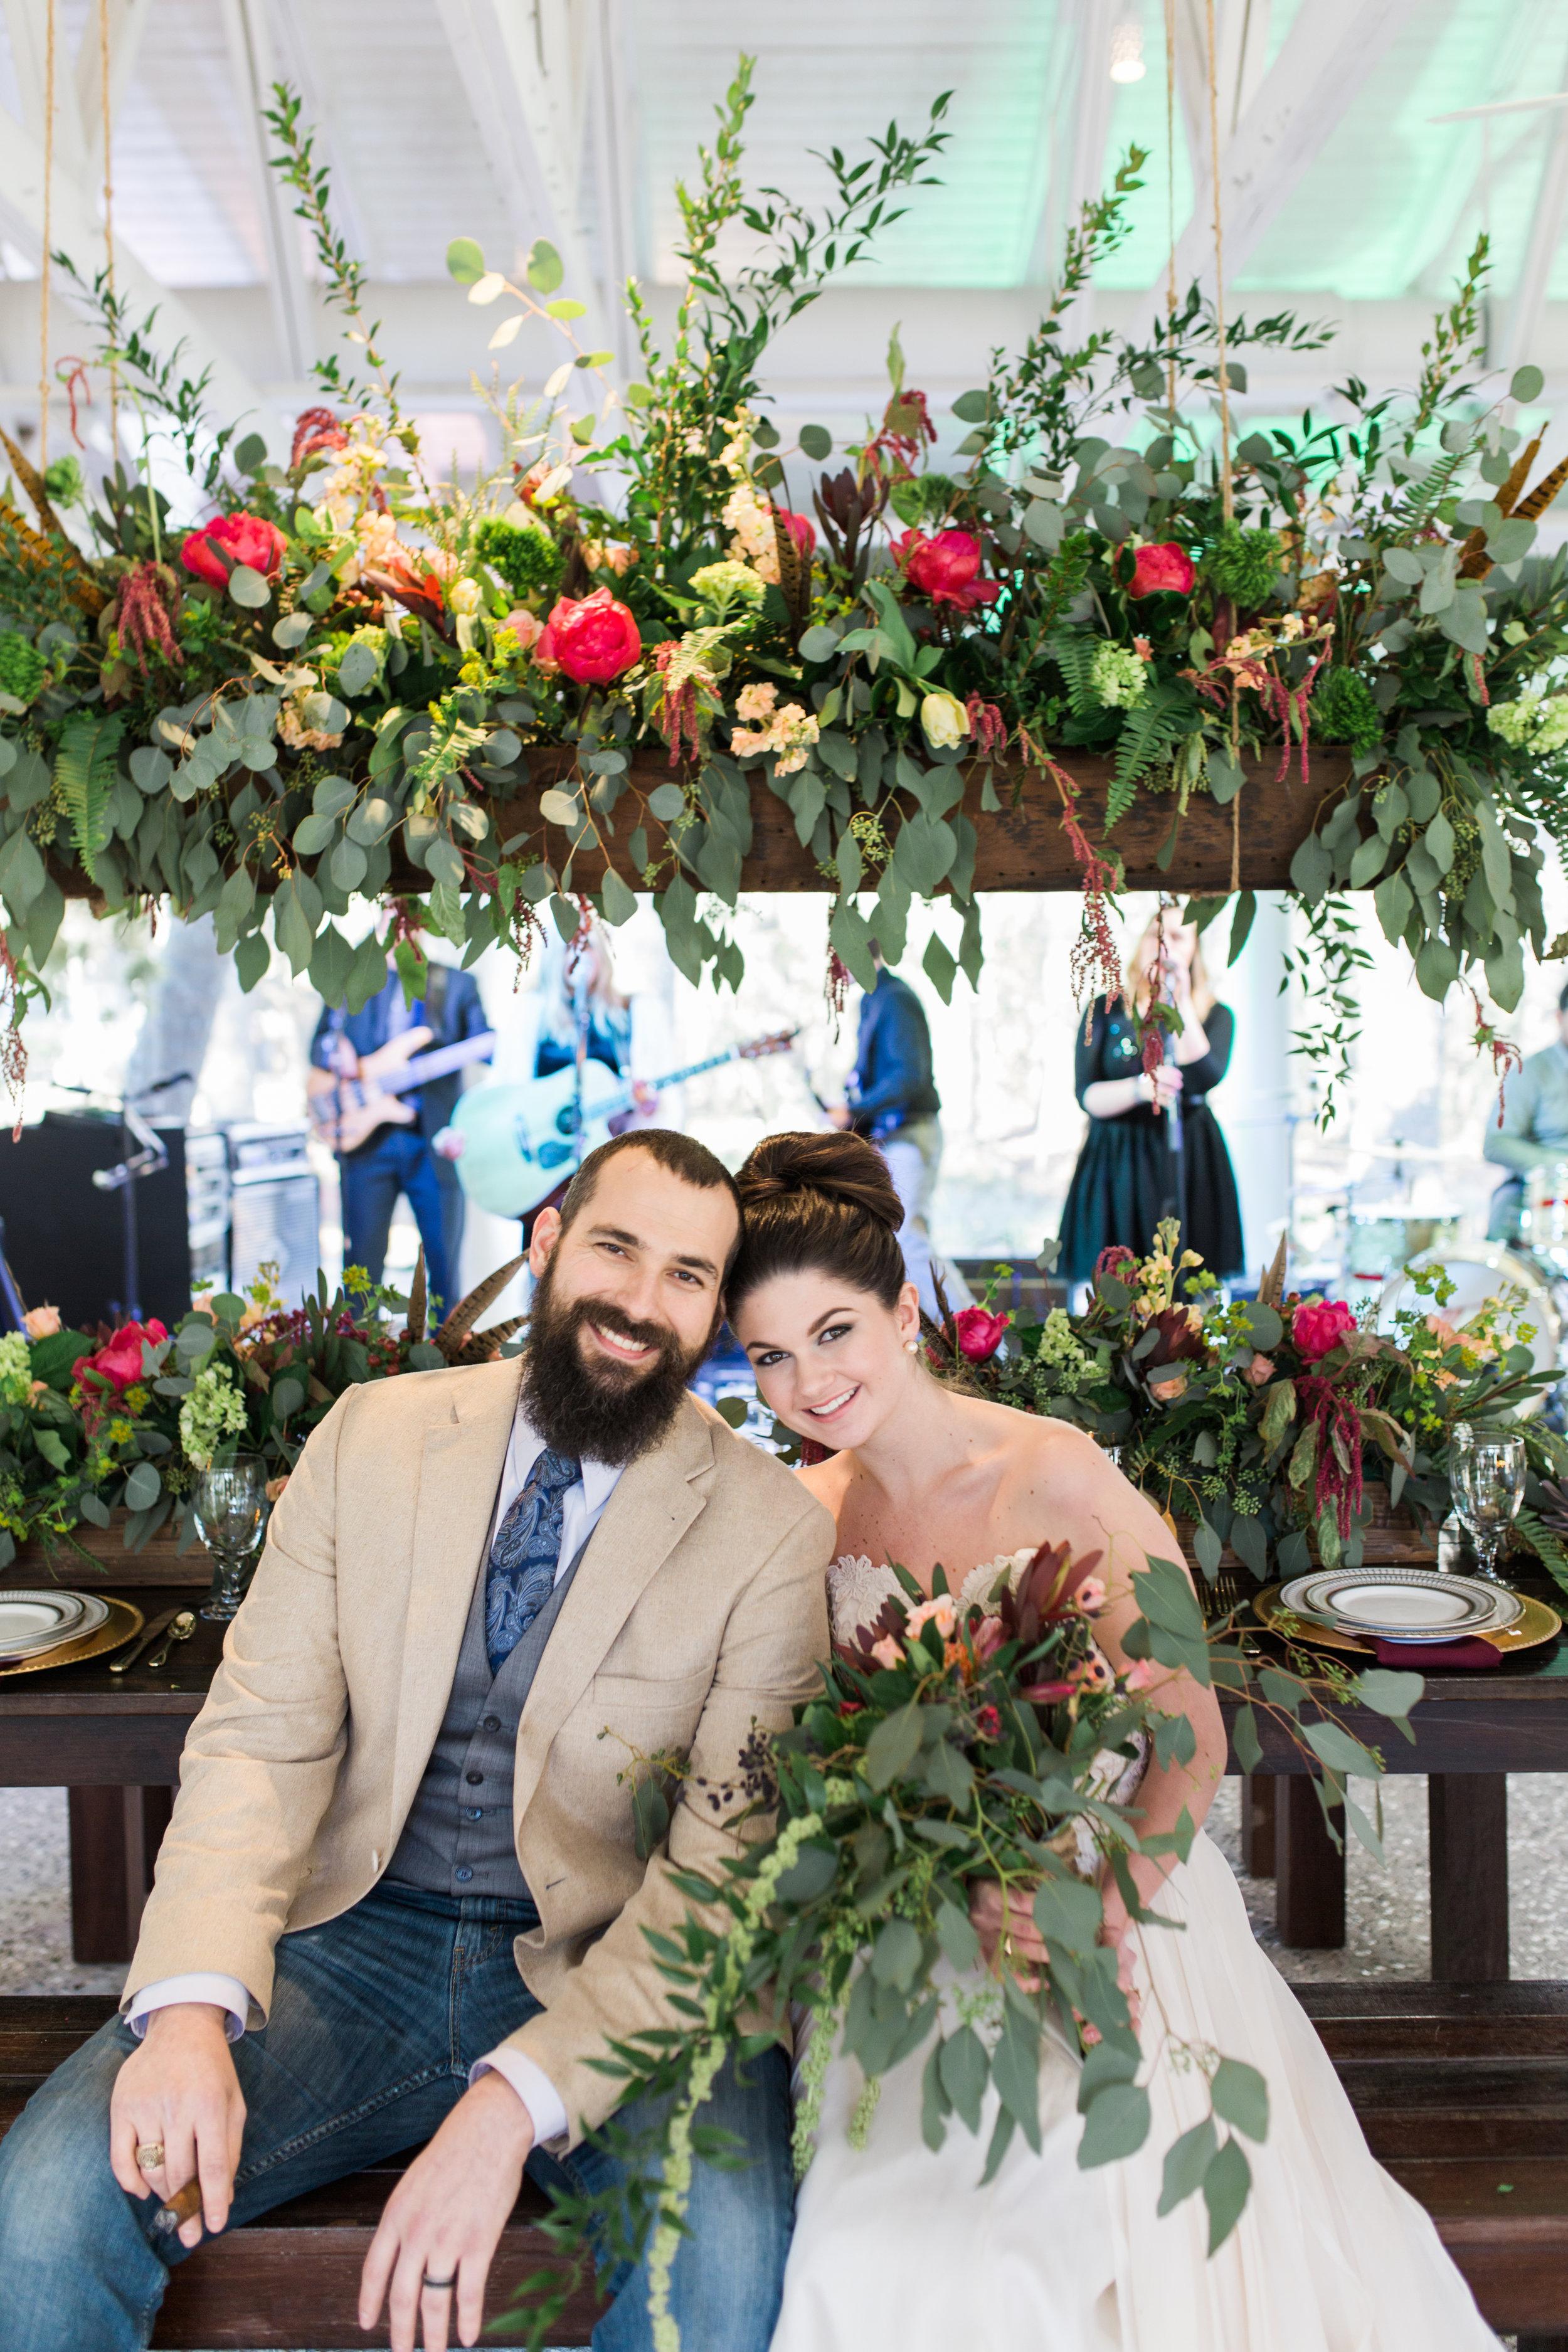 2016 Revolution Wedding Tour | Savannah, GA Photography:  The Click Chick Photography